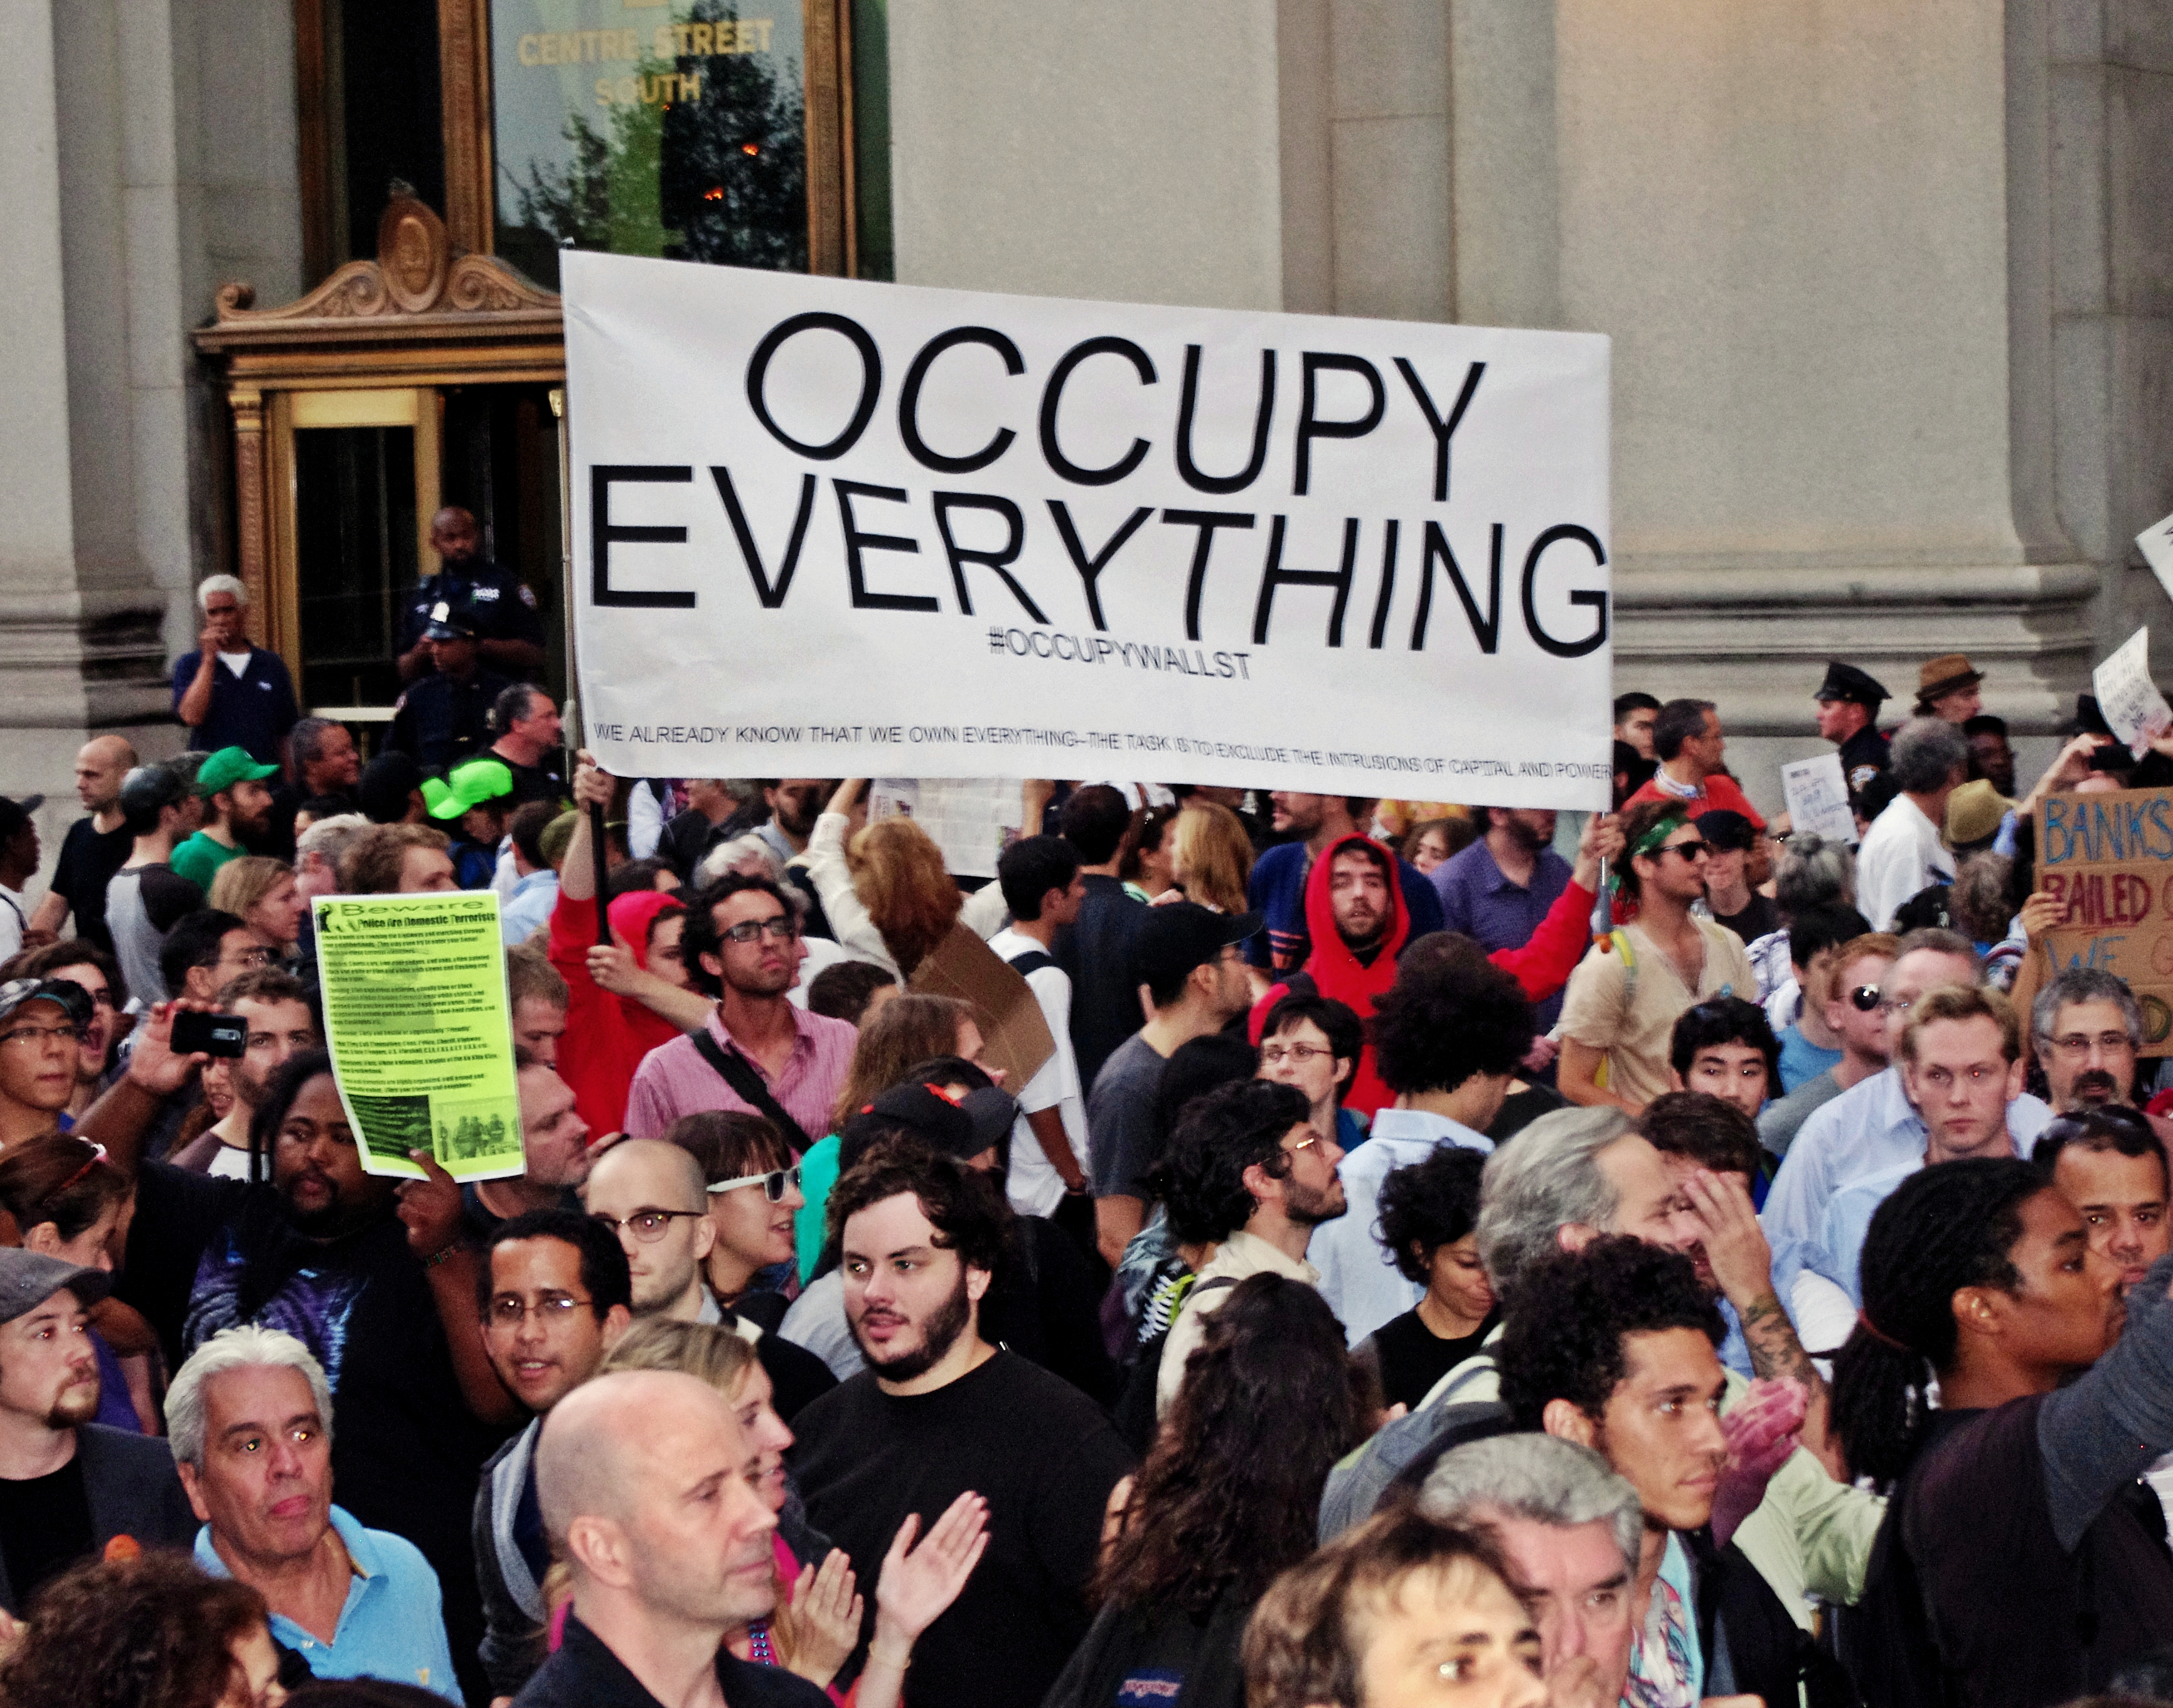 Occupy VFX